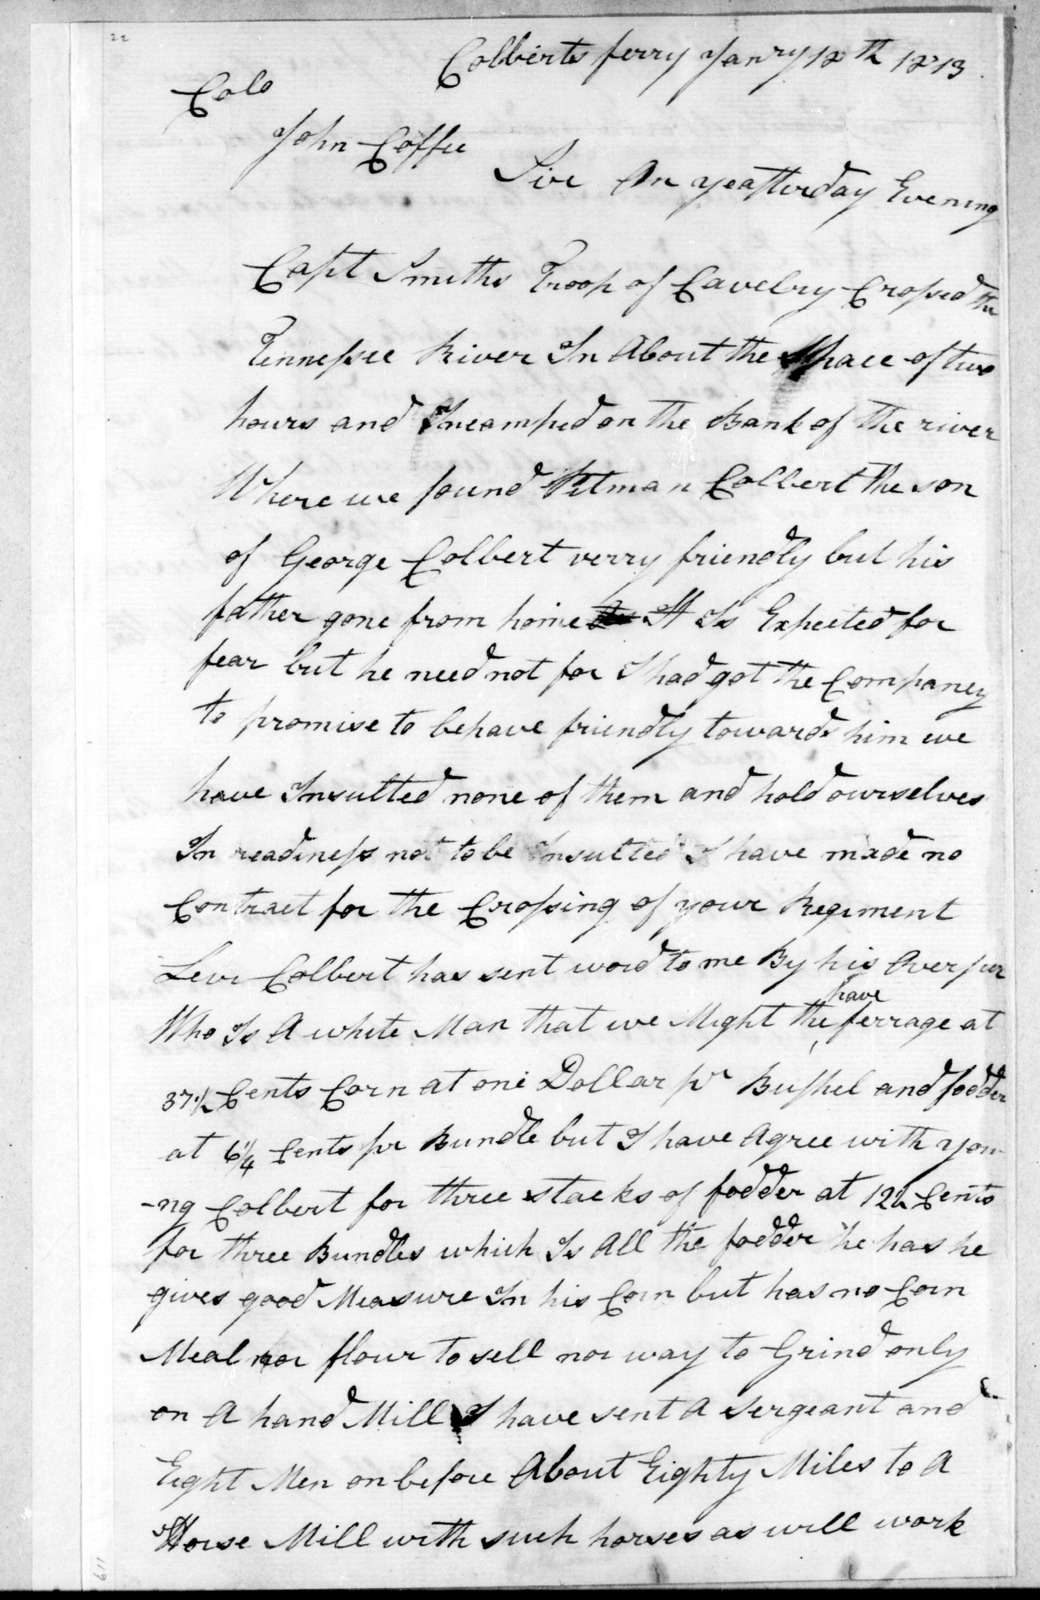 James Henderson to John Coffee, January 12, 1813